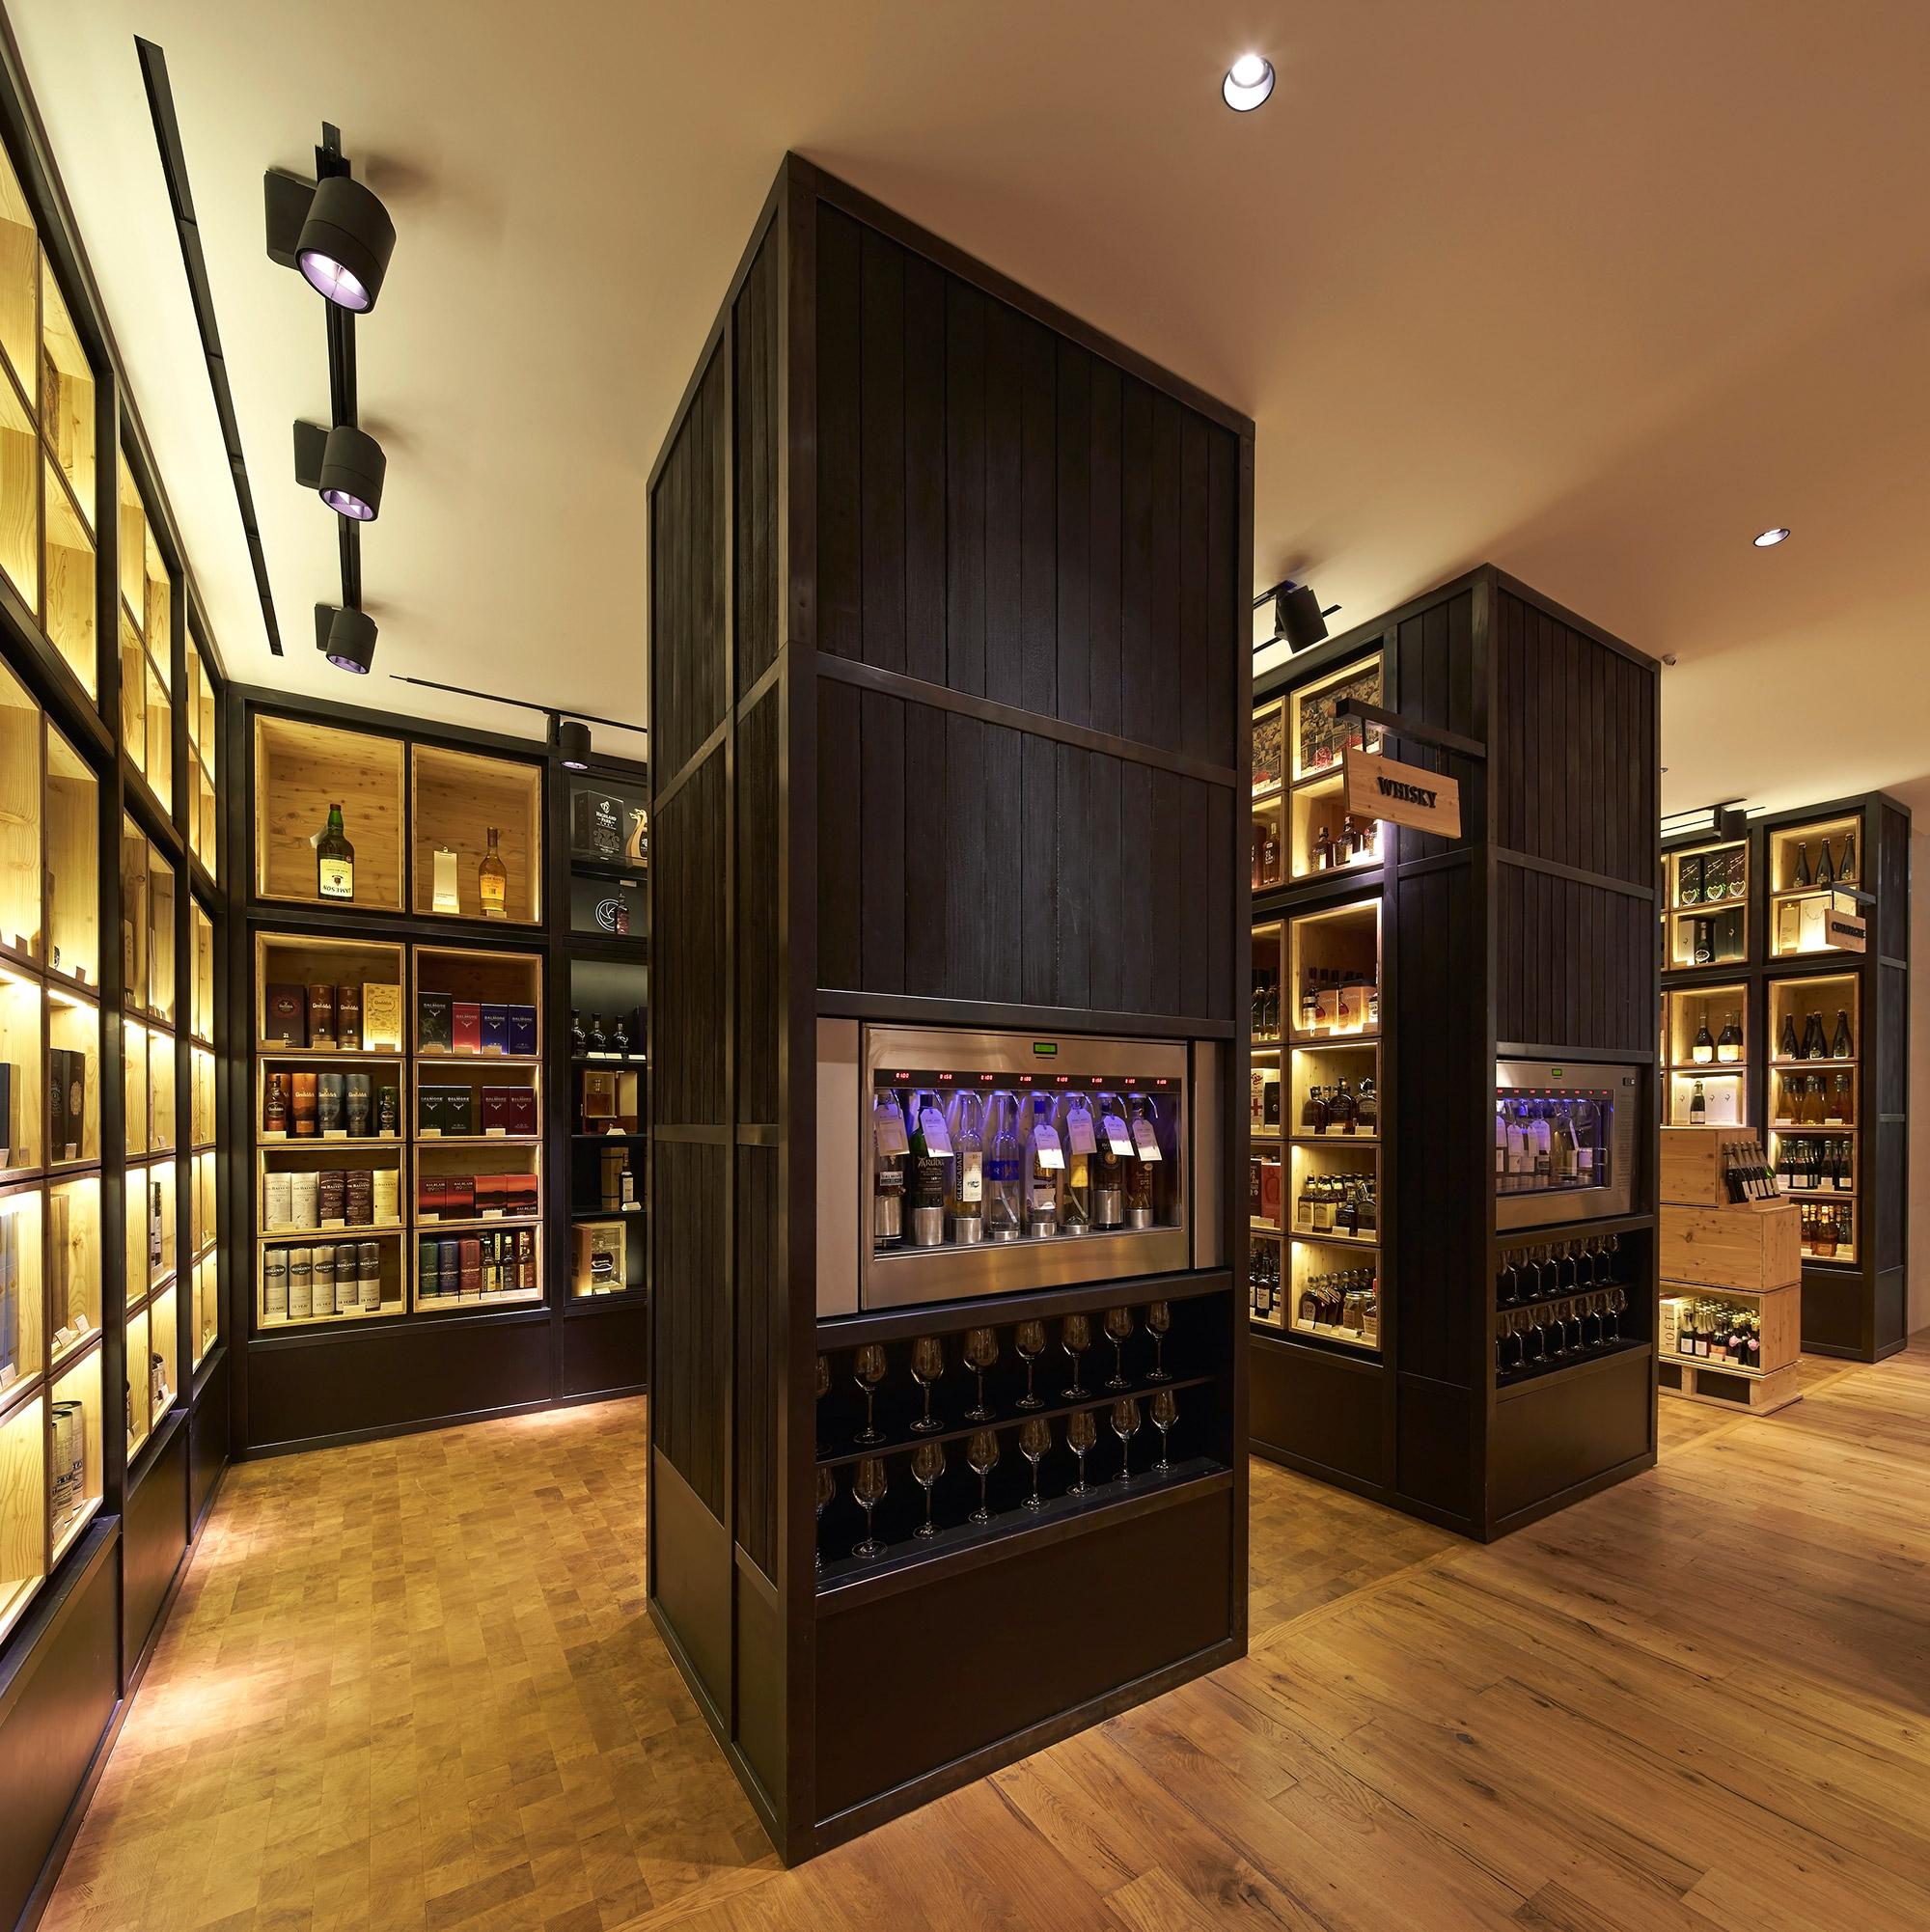 69e7e7b452d9 Campaign Selfridges Wine Shop ∏Hufton+Crow 019w